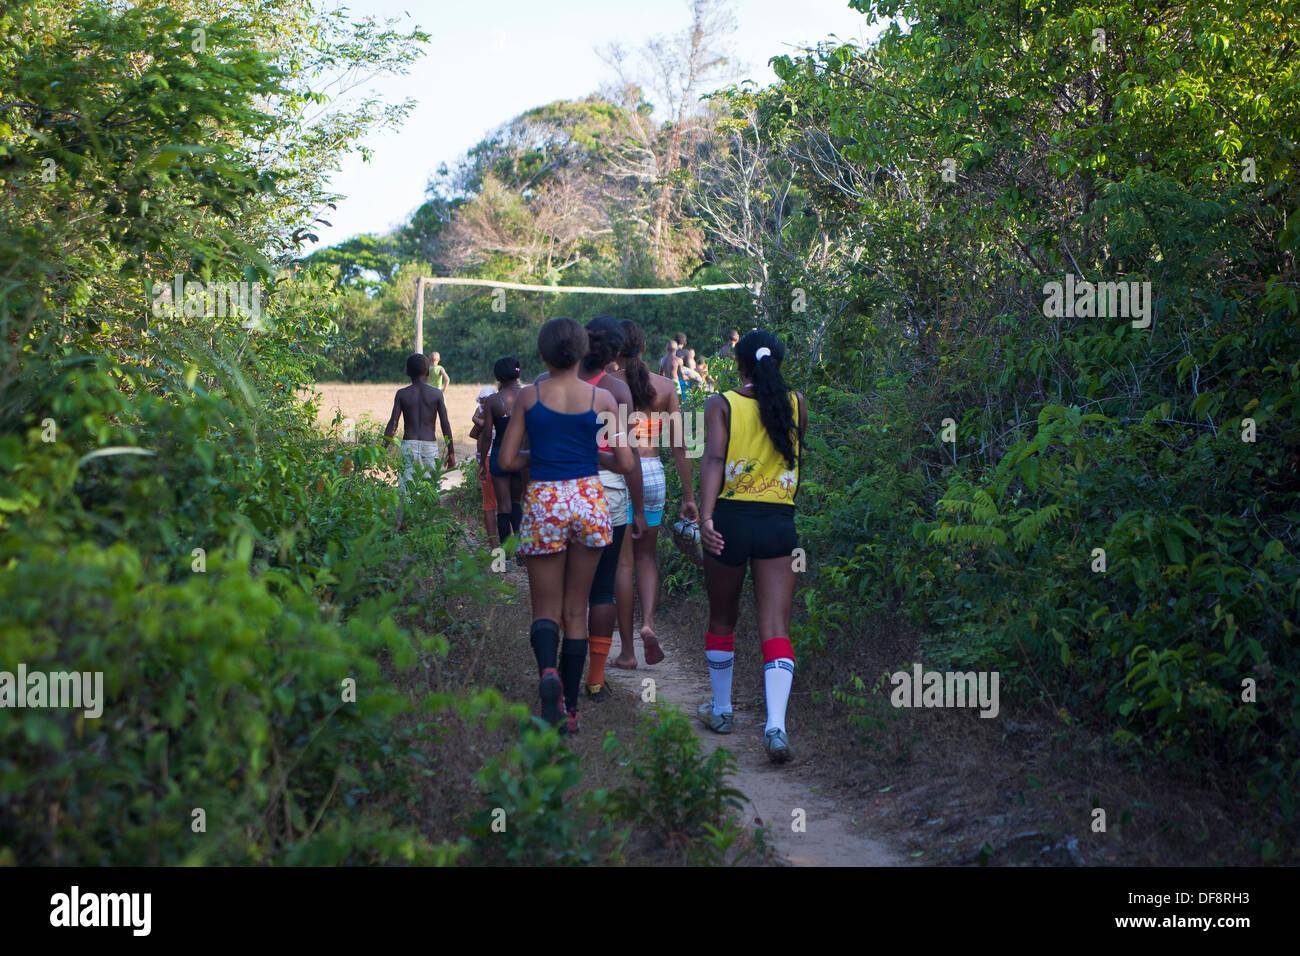 Women play soccer at Rio Grande Quilombo in Alcântara, Maranhão, Northeast Brazil. - Stock Image